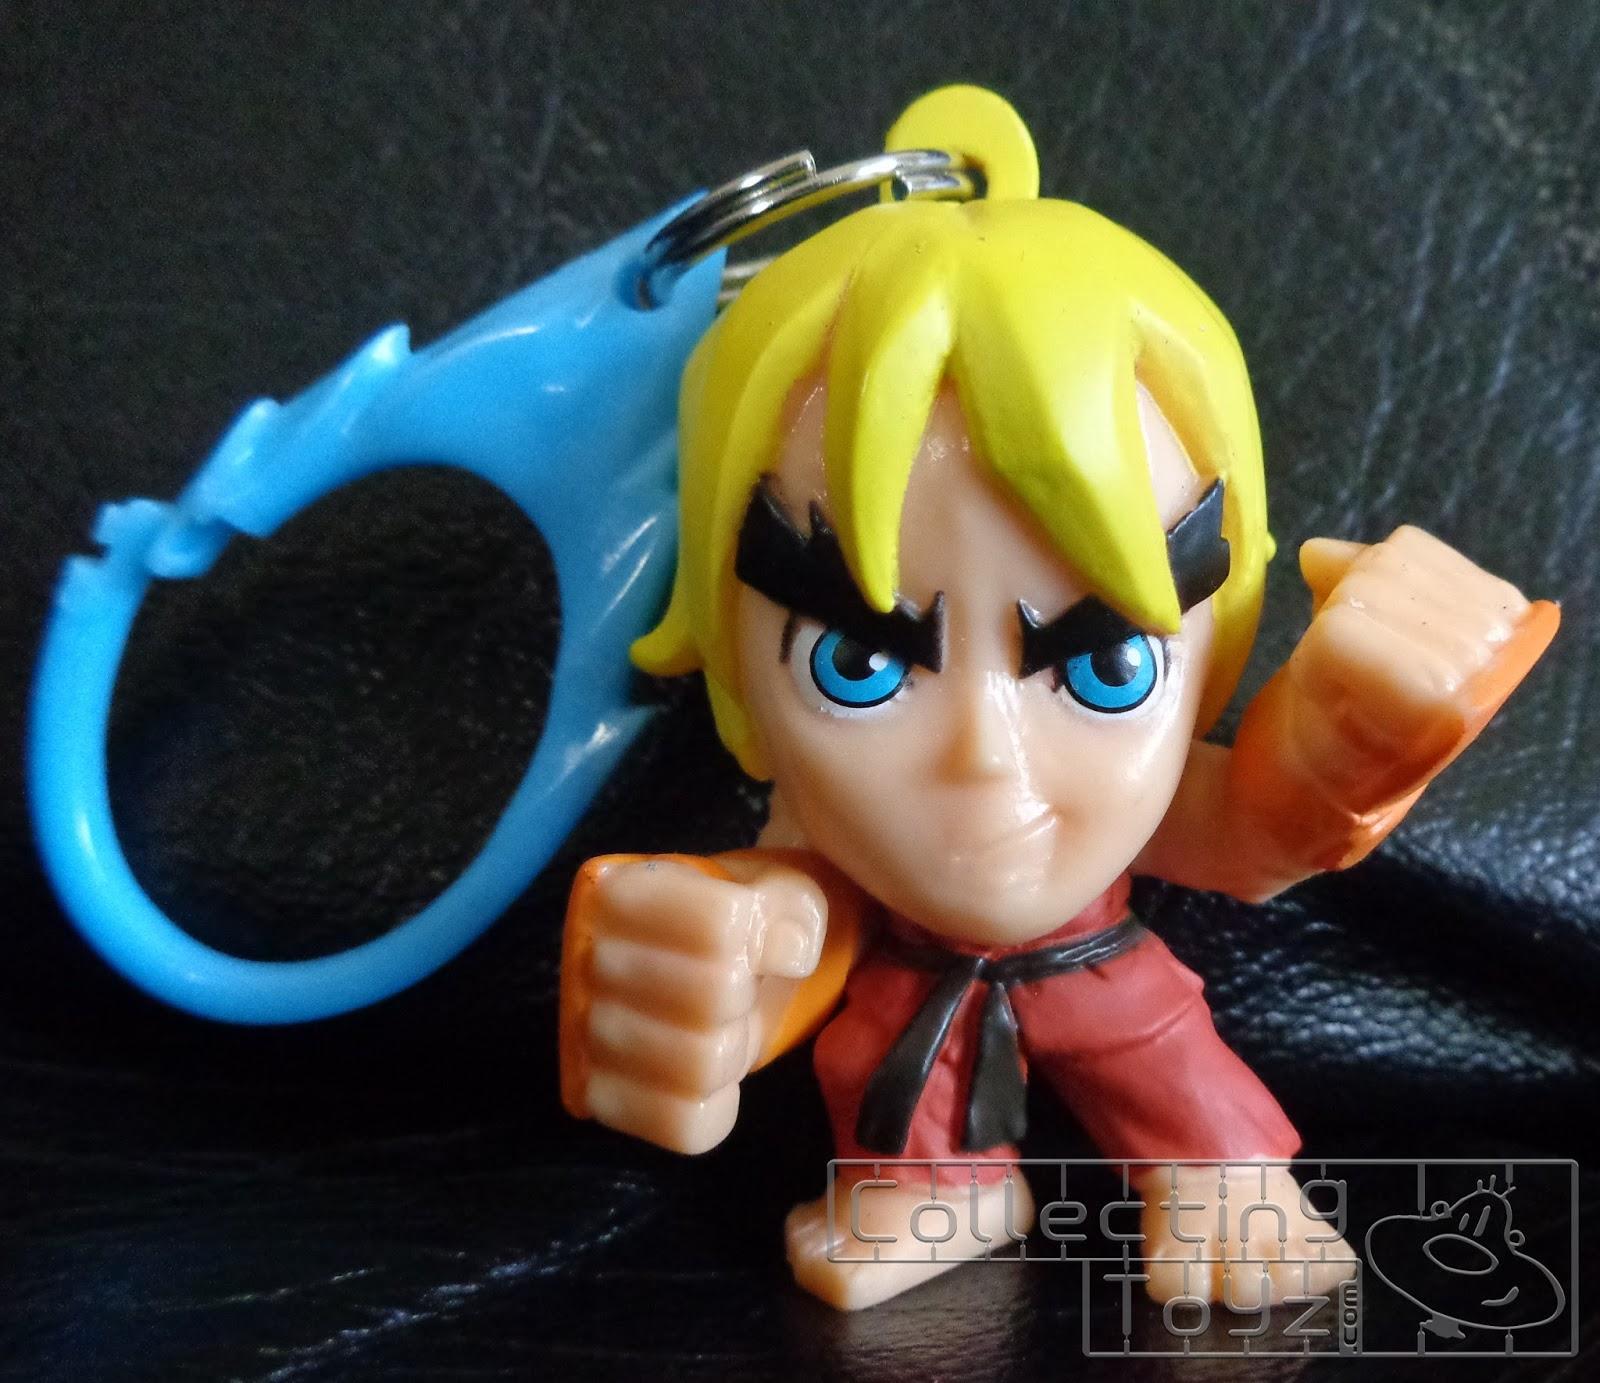 Street Fighter Capcom Backpack Hangers Ken